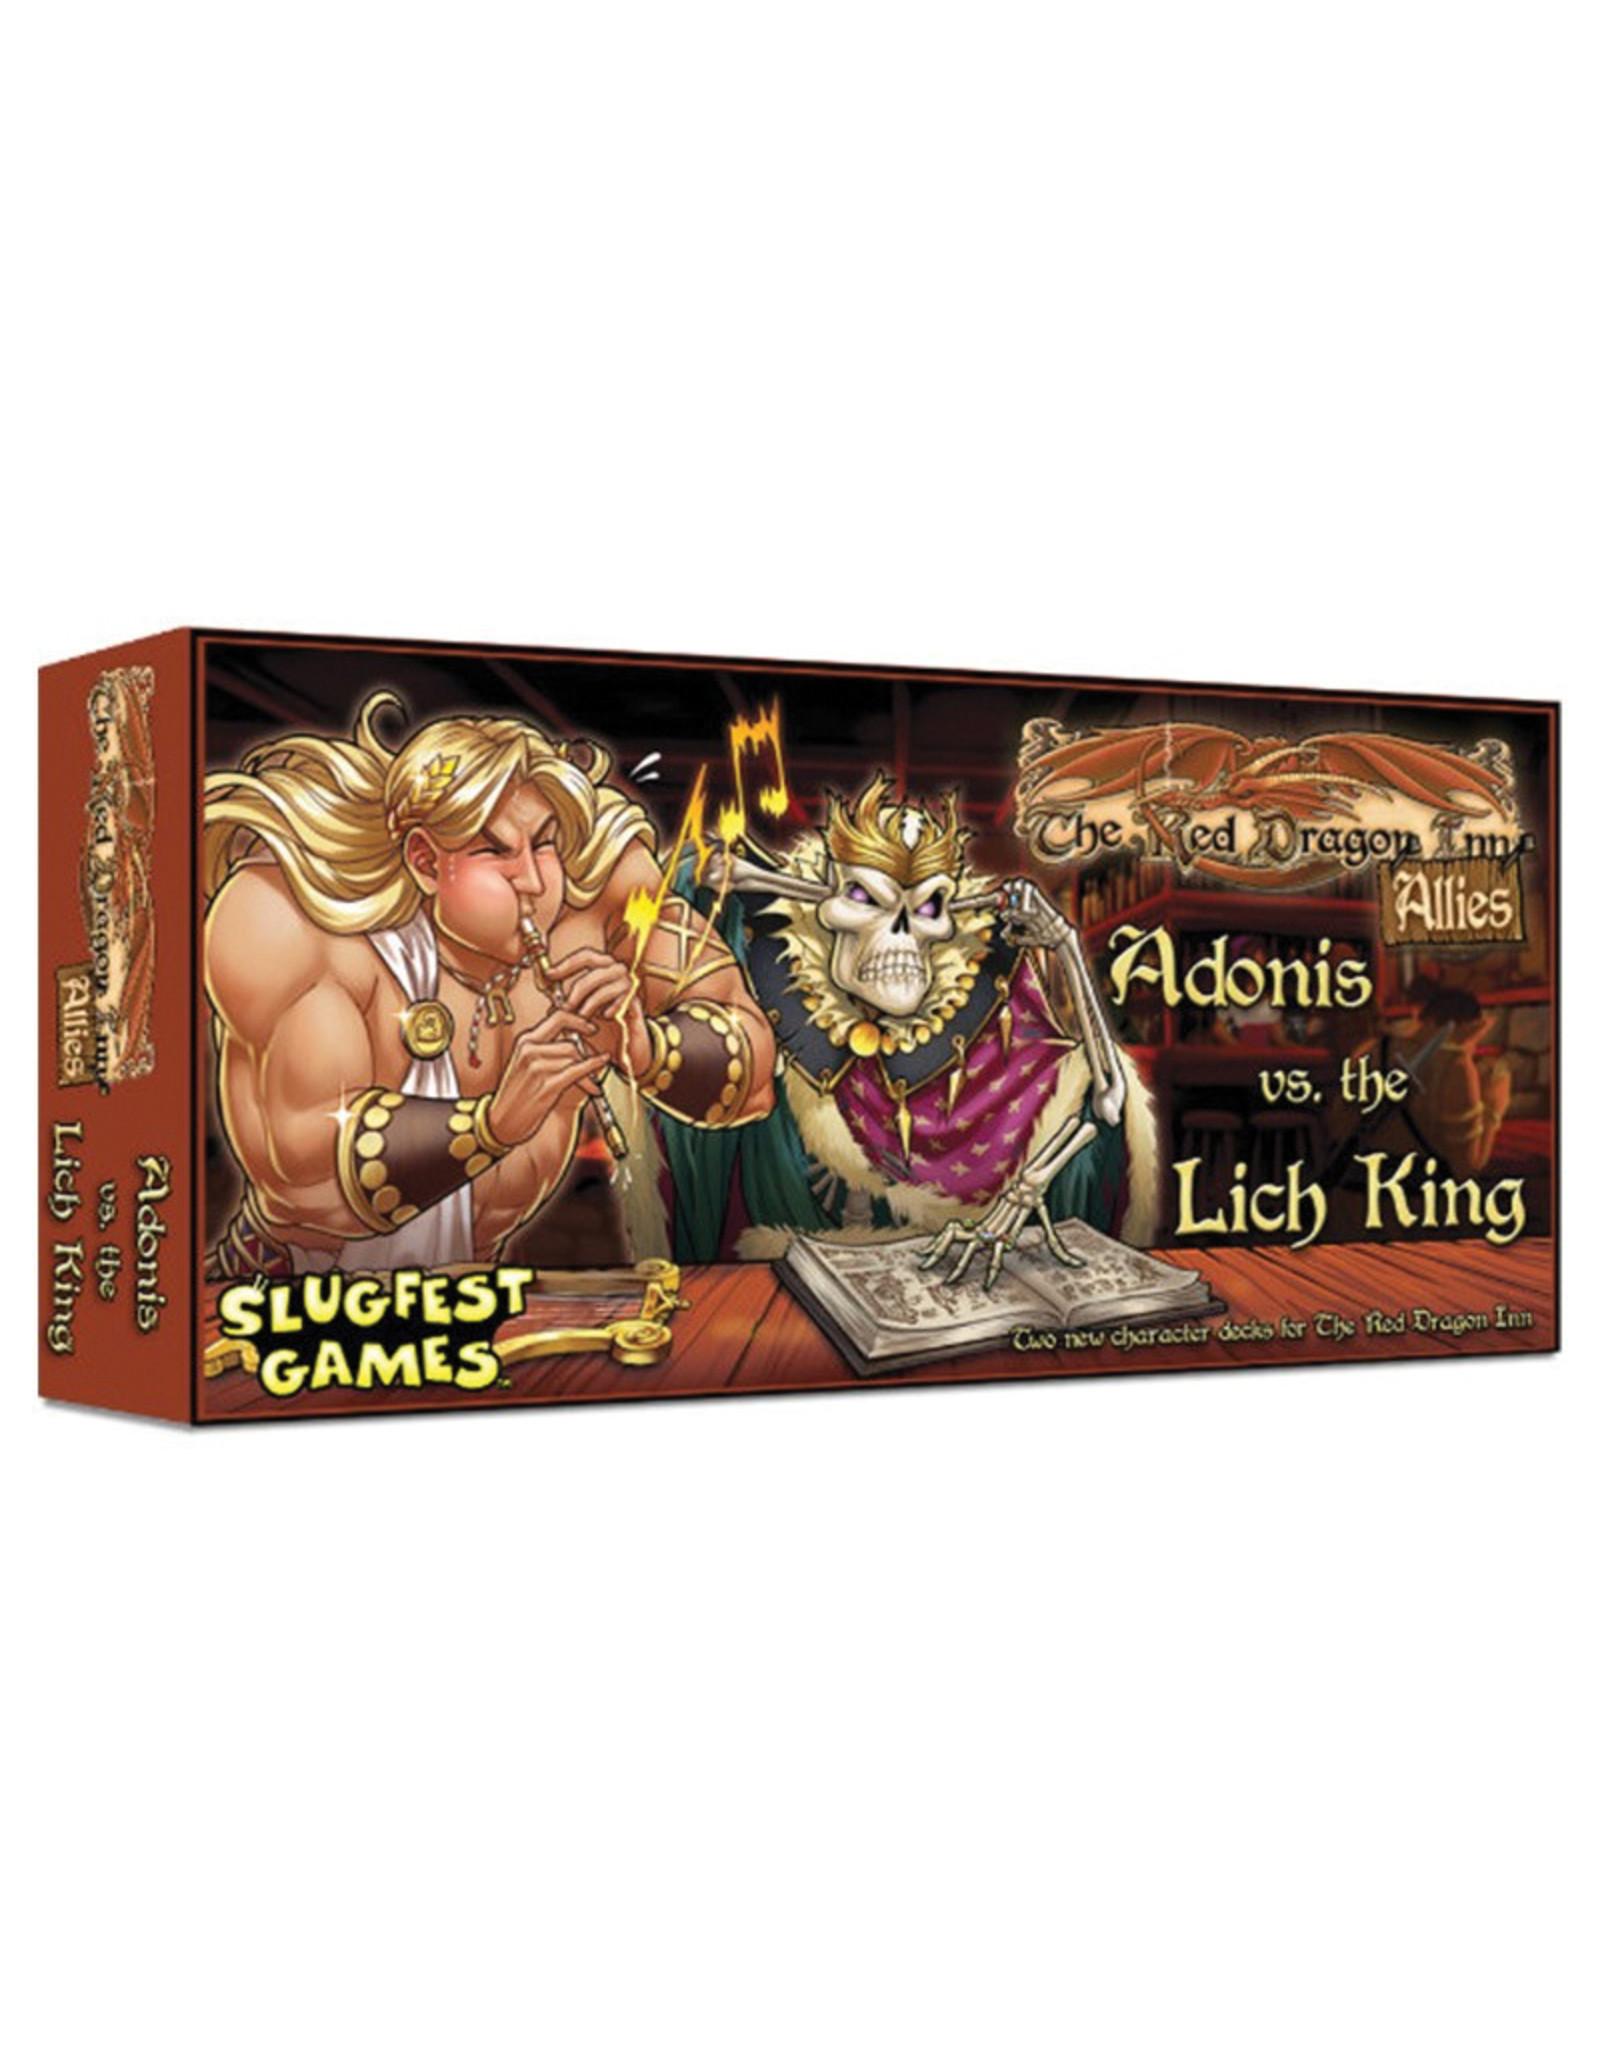 Slugfest Games Red Dragon Inn Allies - Adonis vs the Lich King